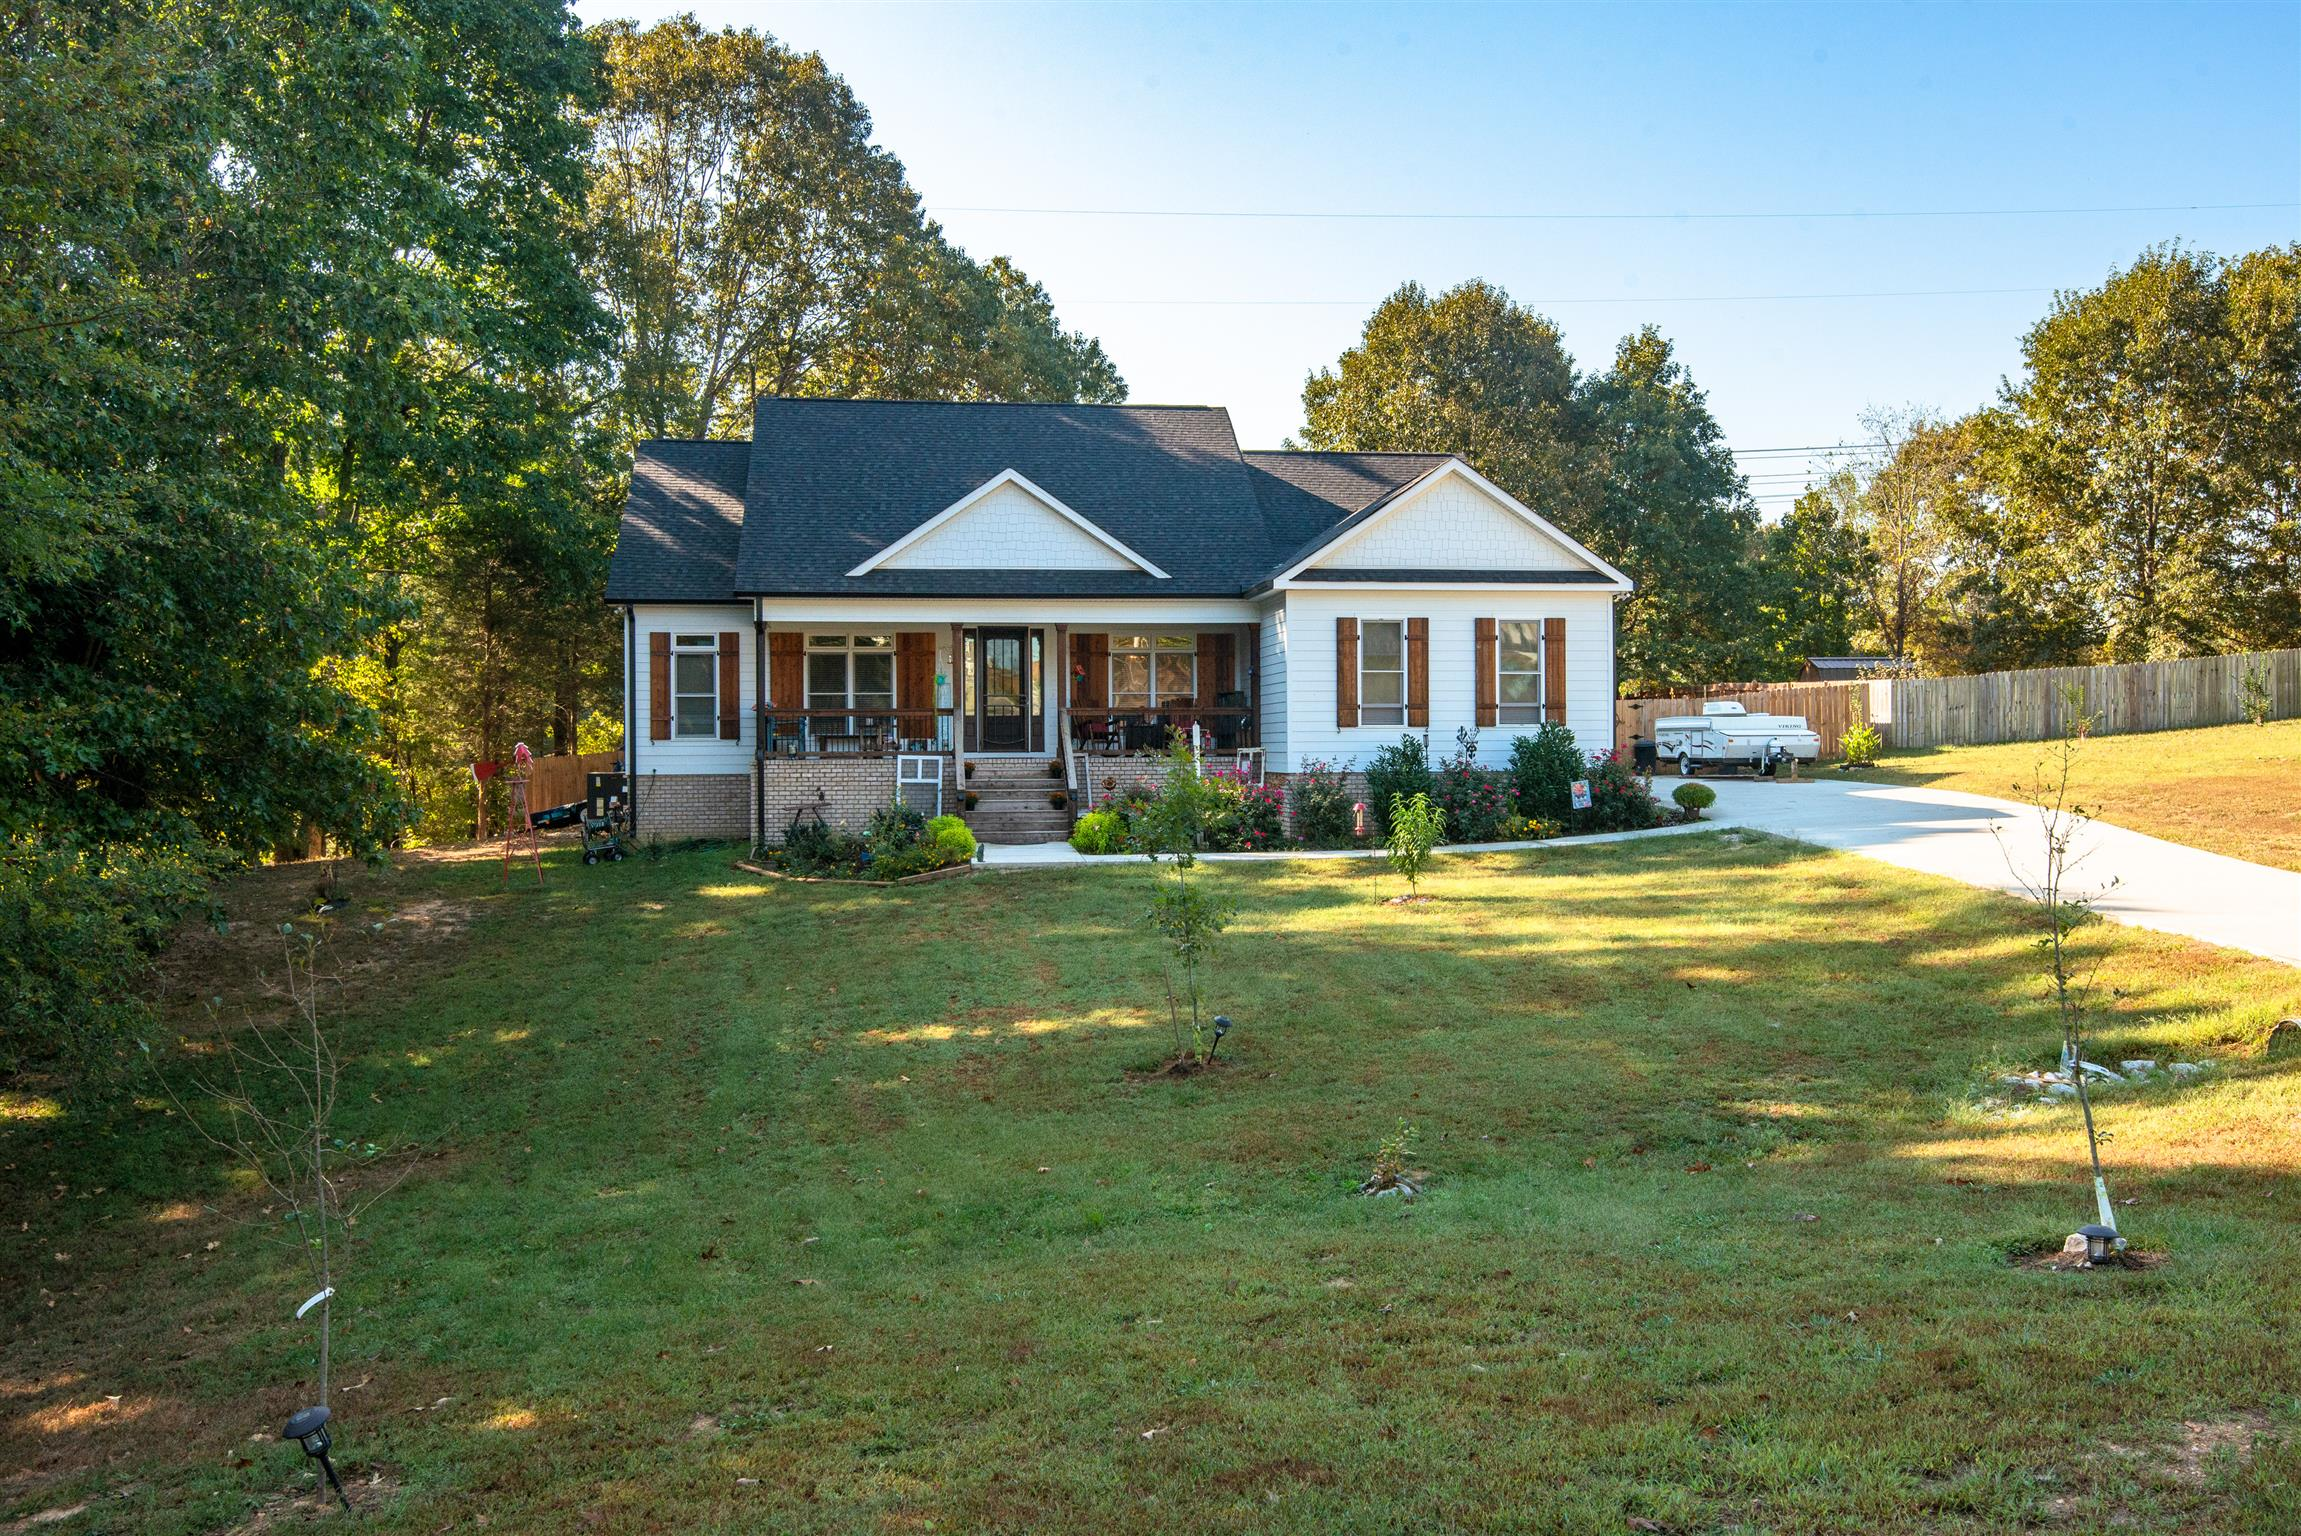 204 Highland Ln, Burns, TN 37029 - Burns, TN real estate listing